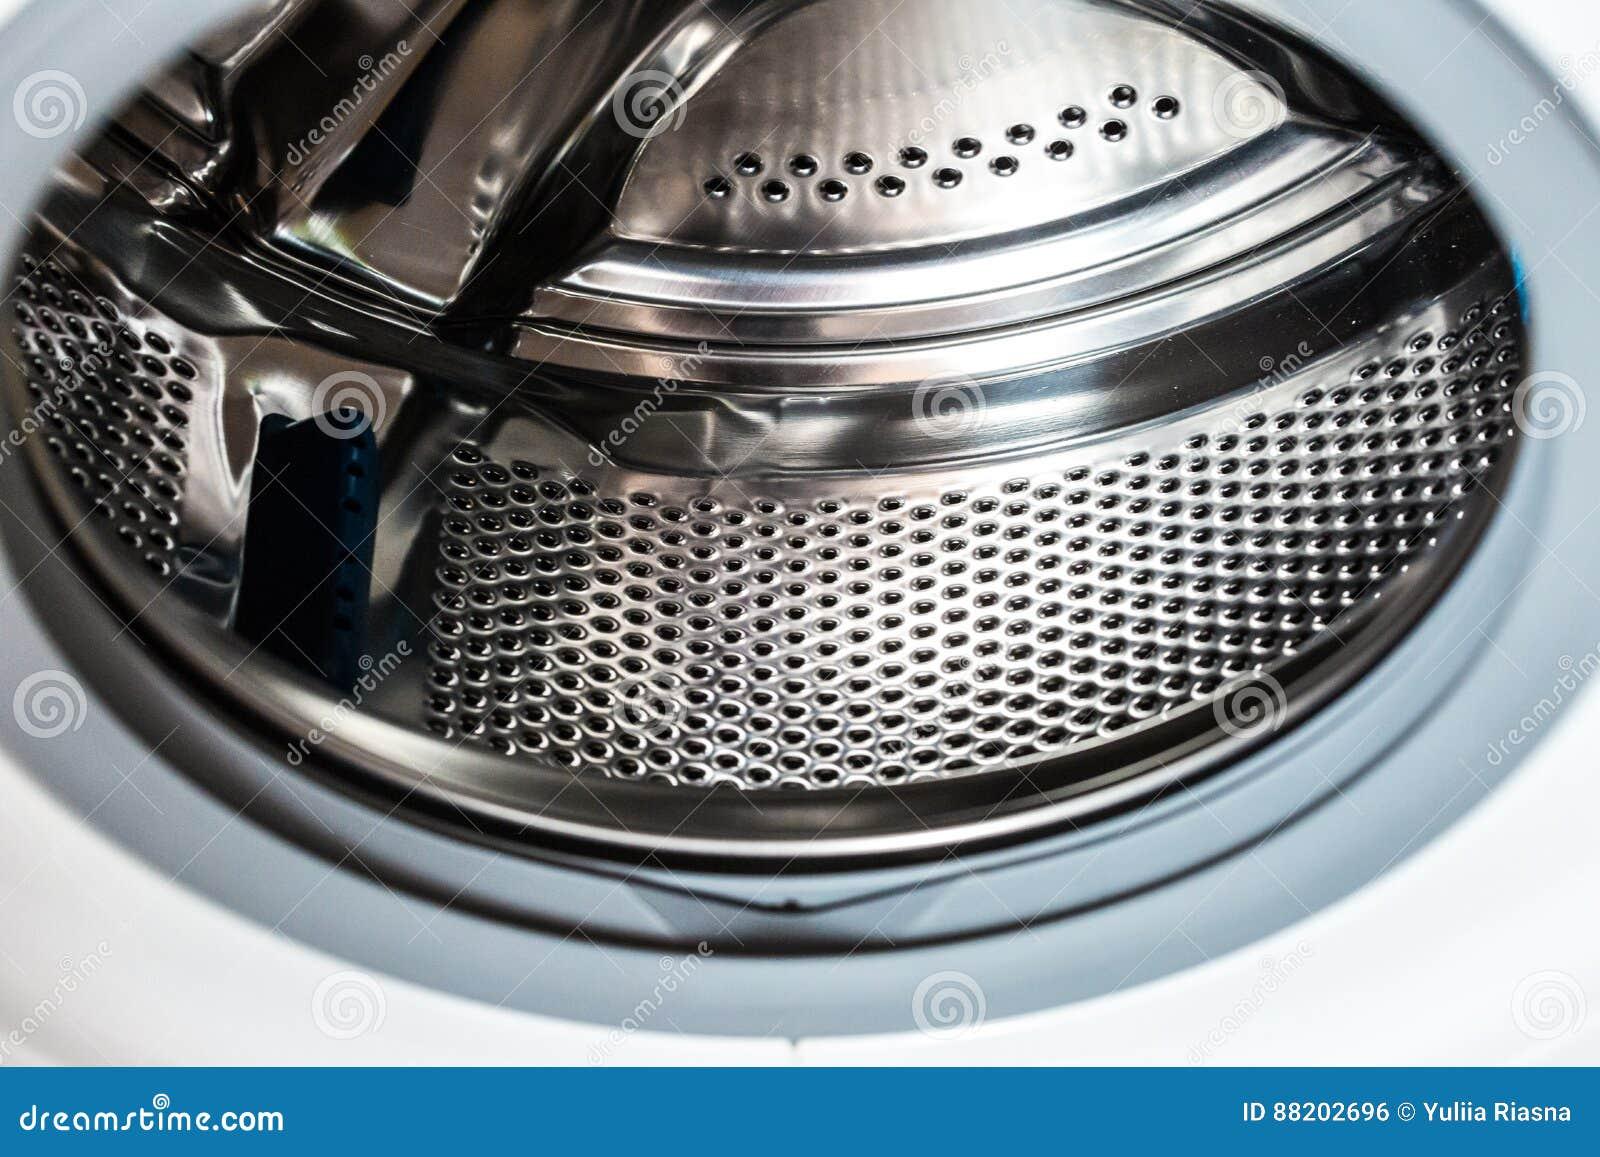 washing machine inside stock photo image of blue clean 88202696. Black Bedroom Furniture Sets. Home Design Ideas